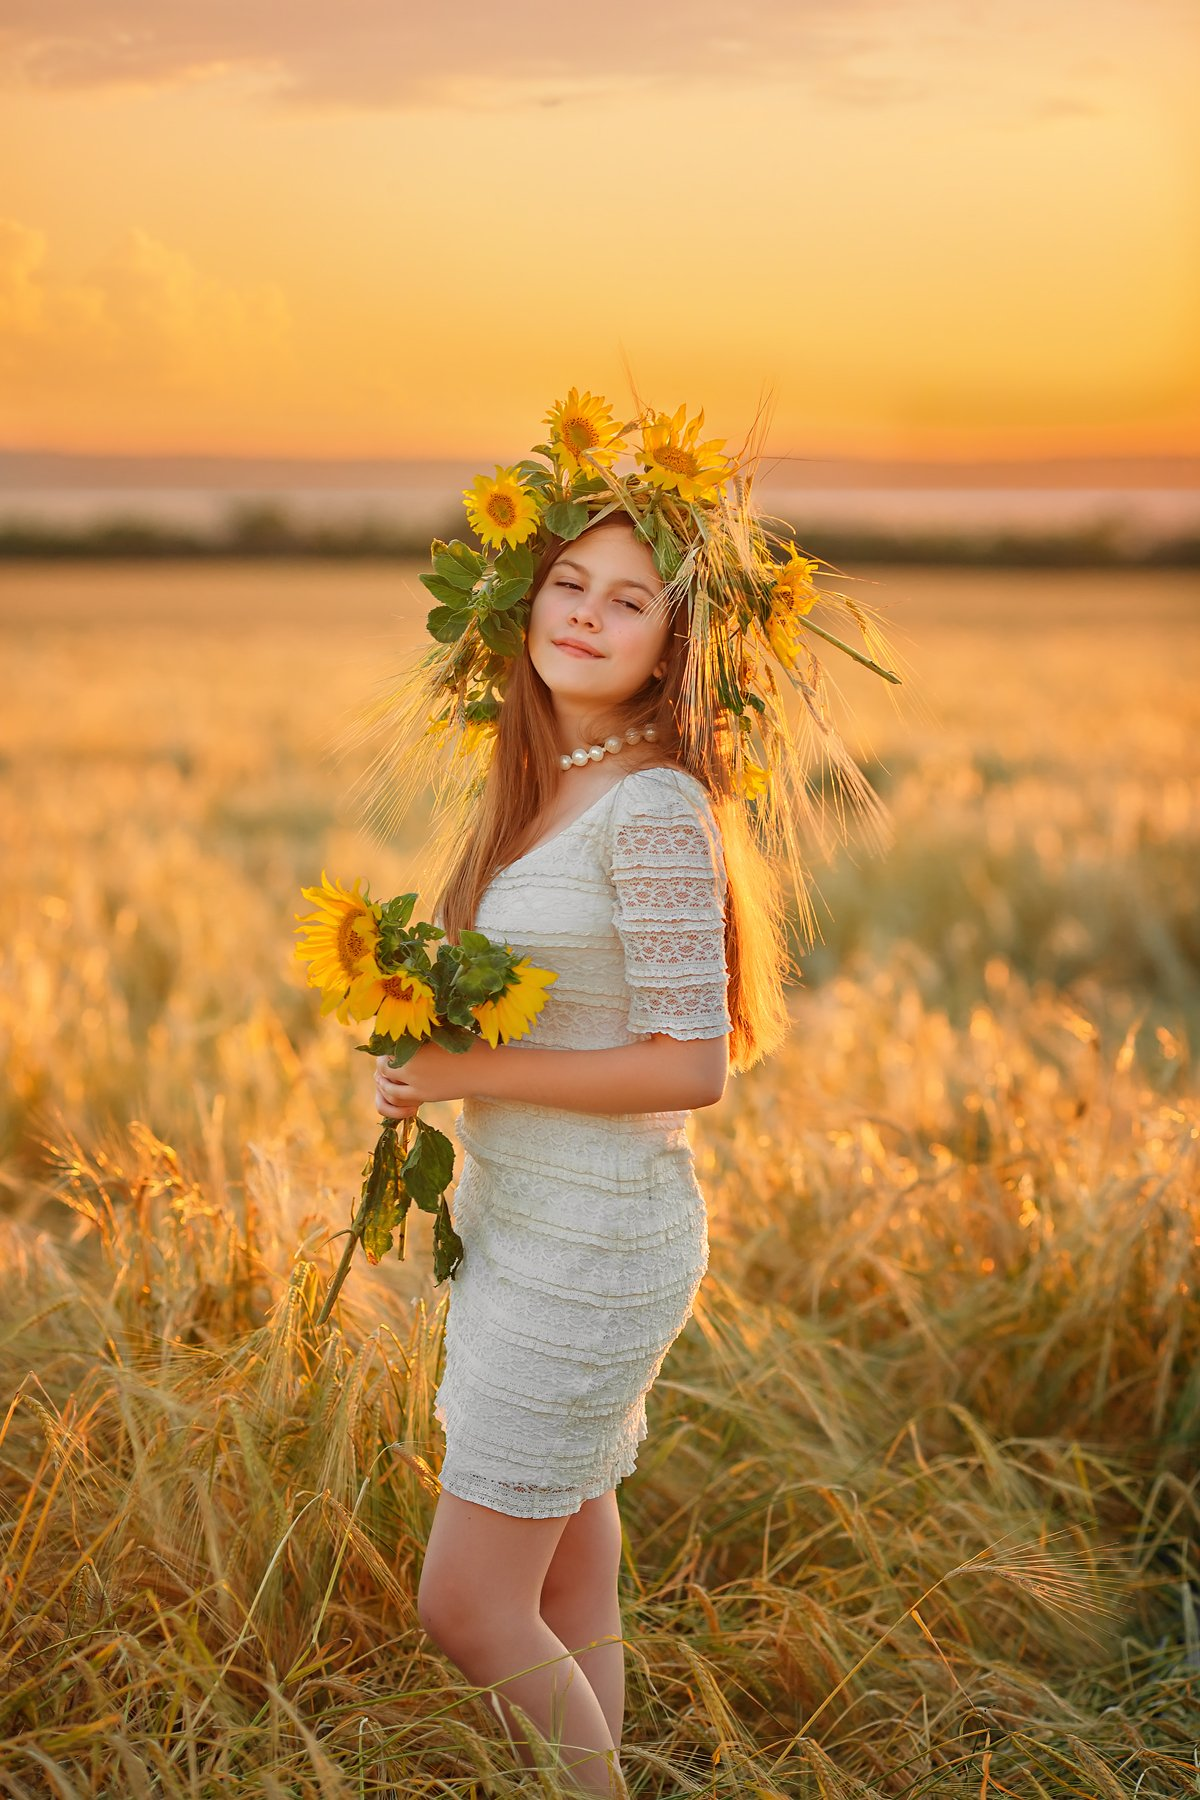 лето поле подсолнухи девочка дети закат венок натура природа солнечный, Марина Кондратова